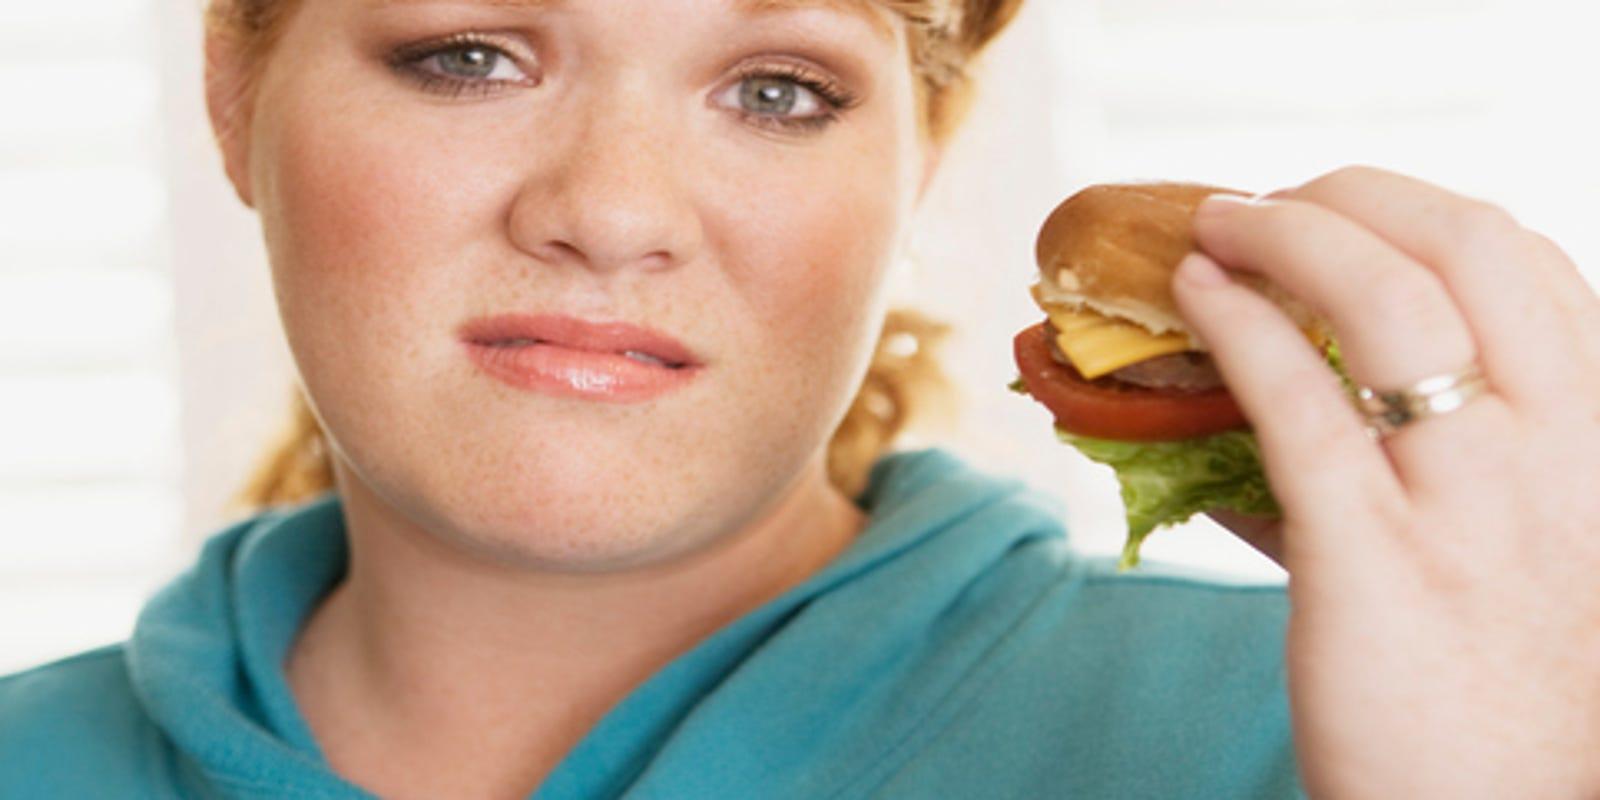 Wife's negative attitude erodes feelings in long marriage